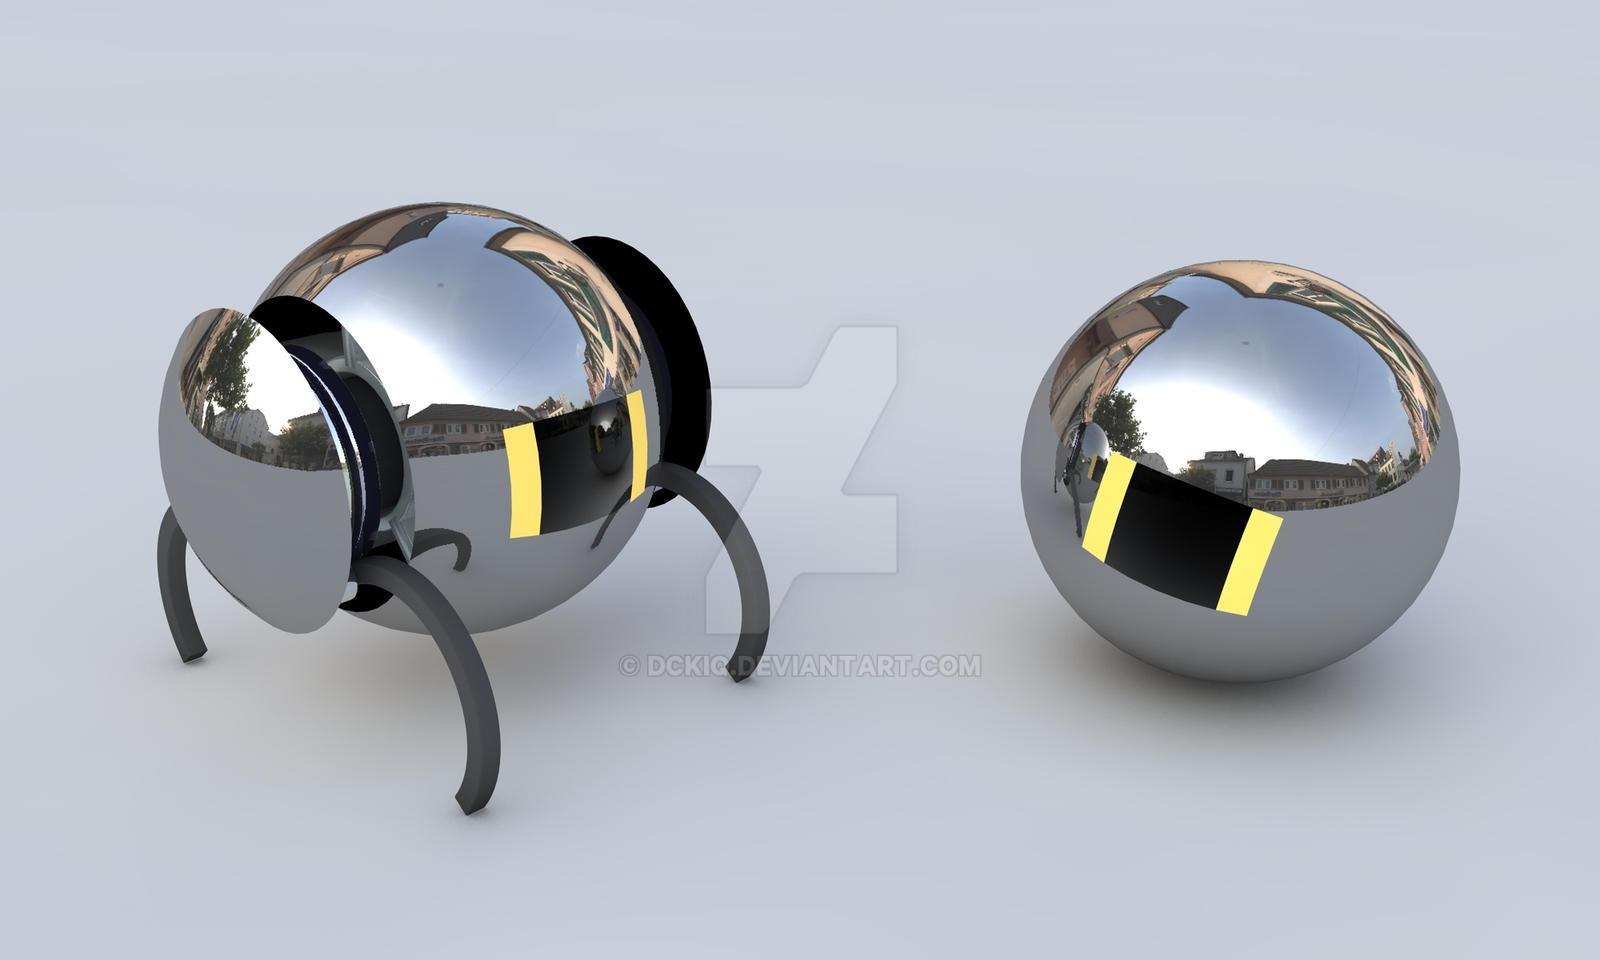 Spheroid by DCkiq